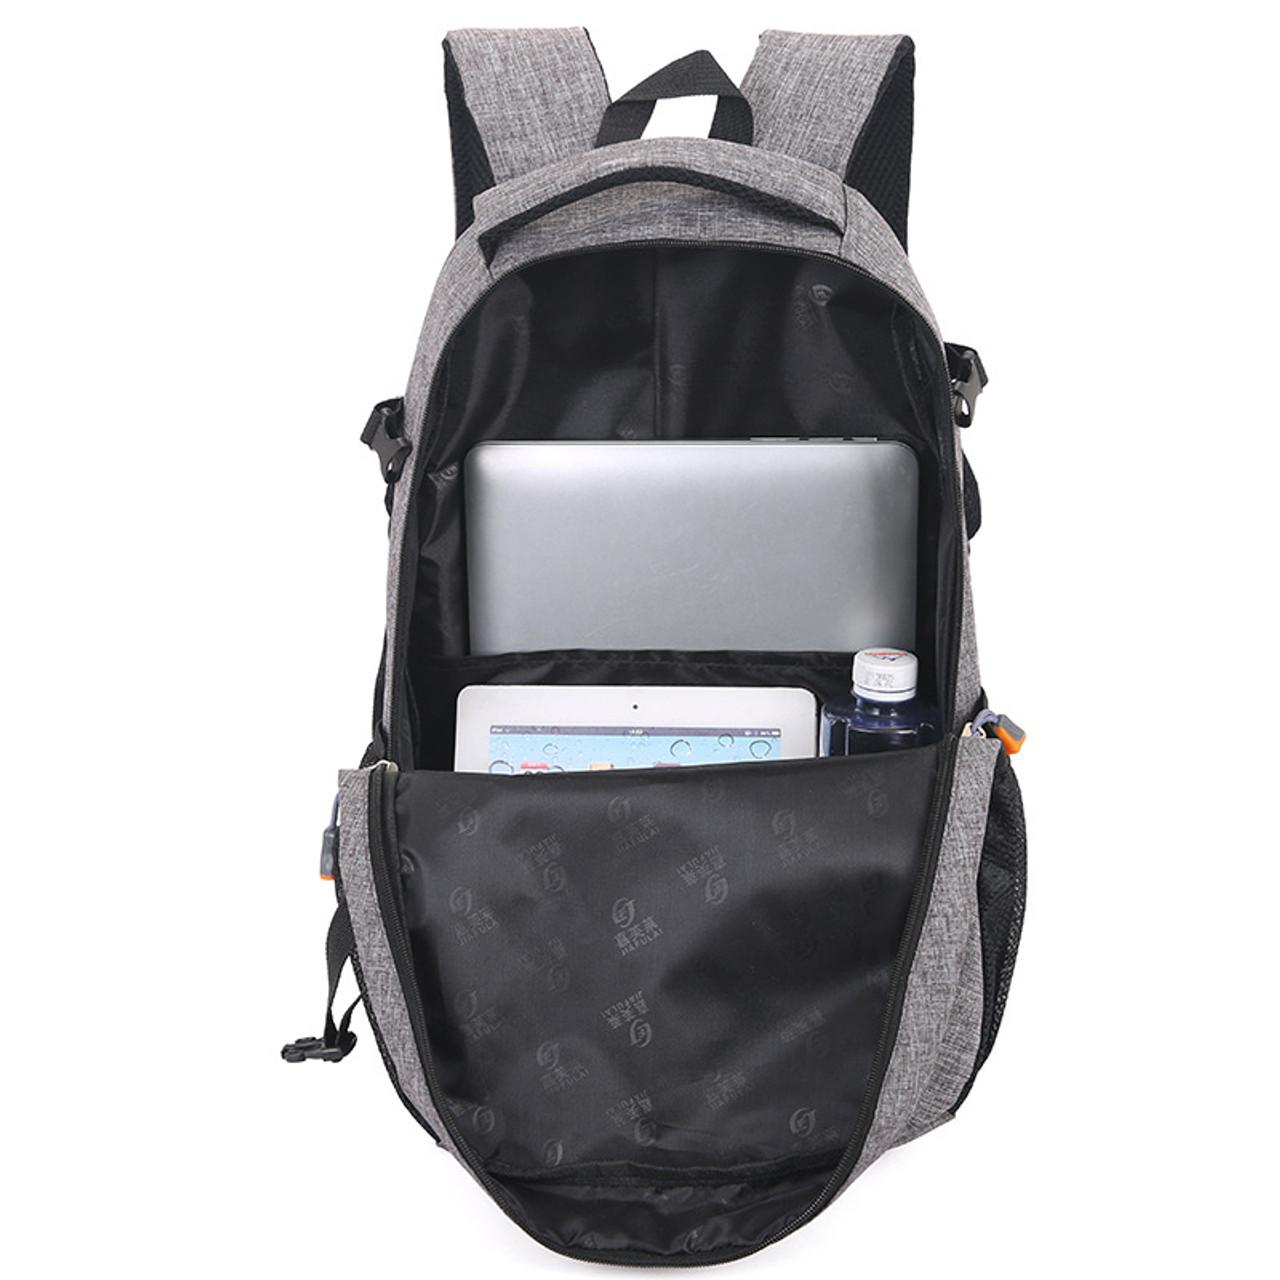 02f29f344849 ... Men s Backpack Women Backpack Female School Bag For Teenagers Men  Laptop Backpacks Men Travel Bags Large ...